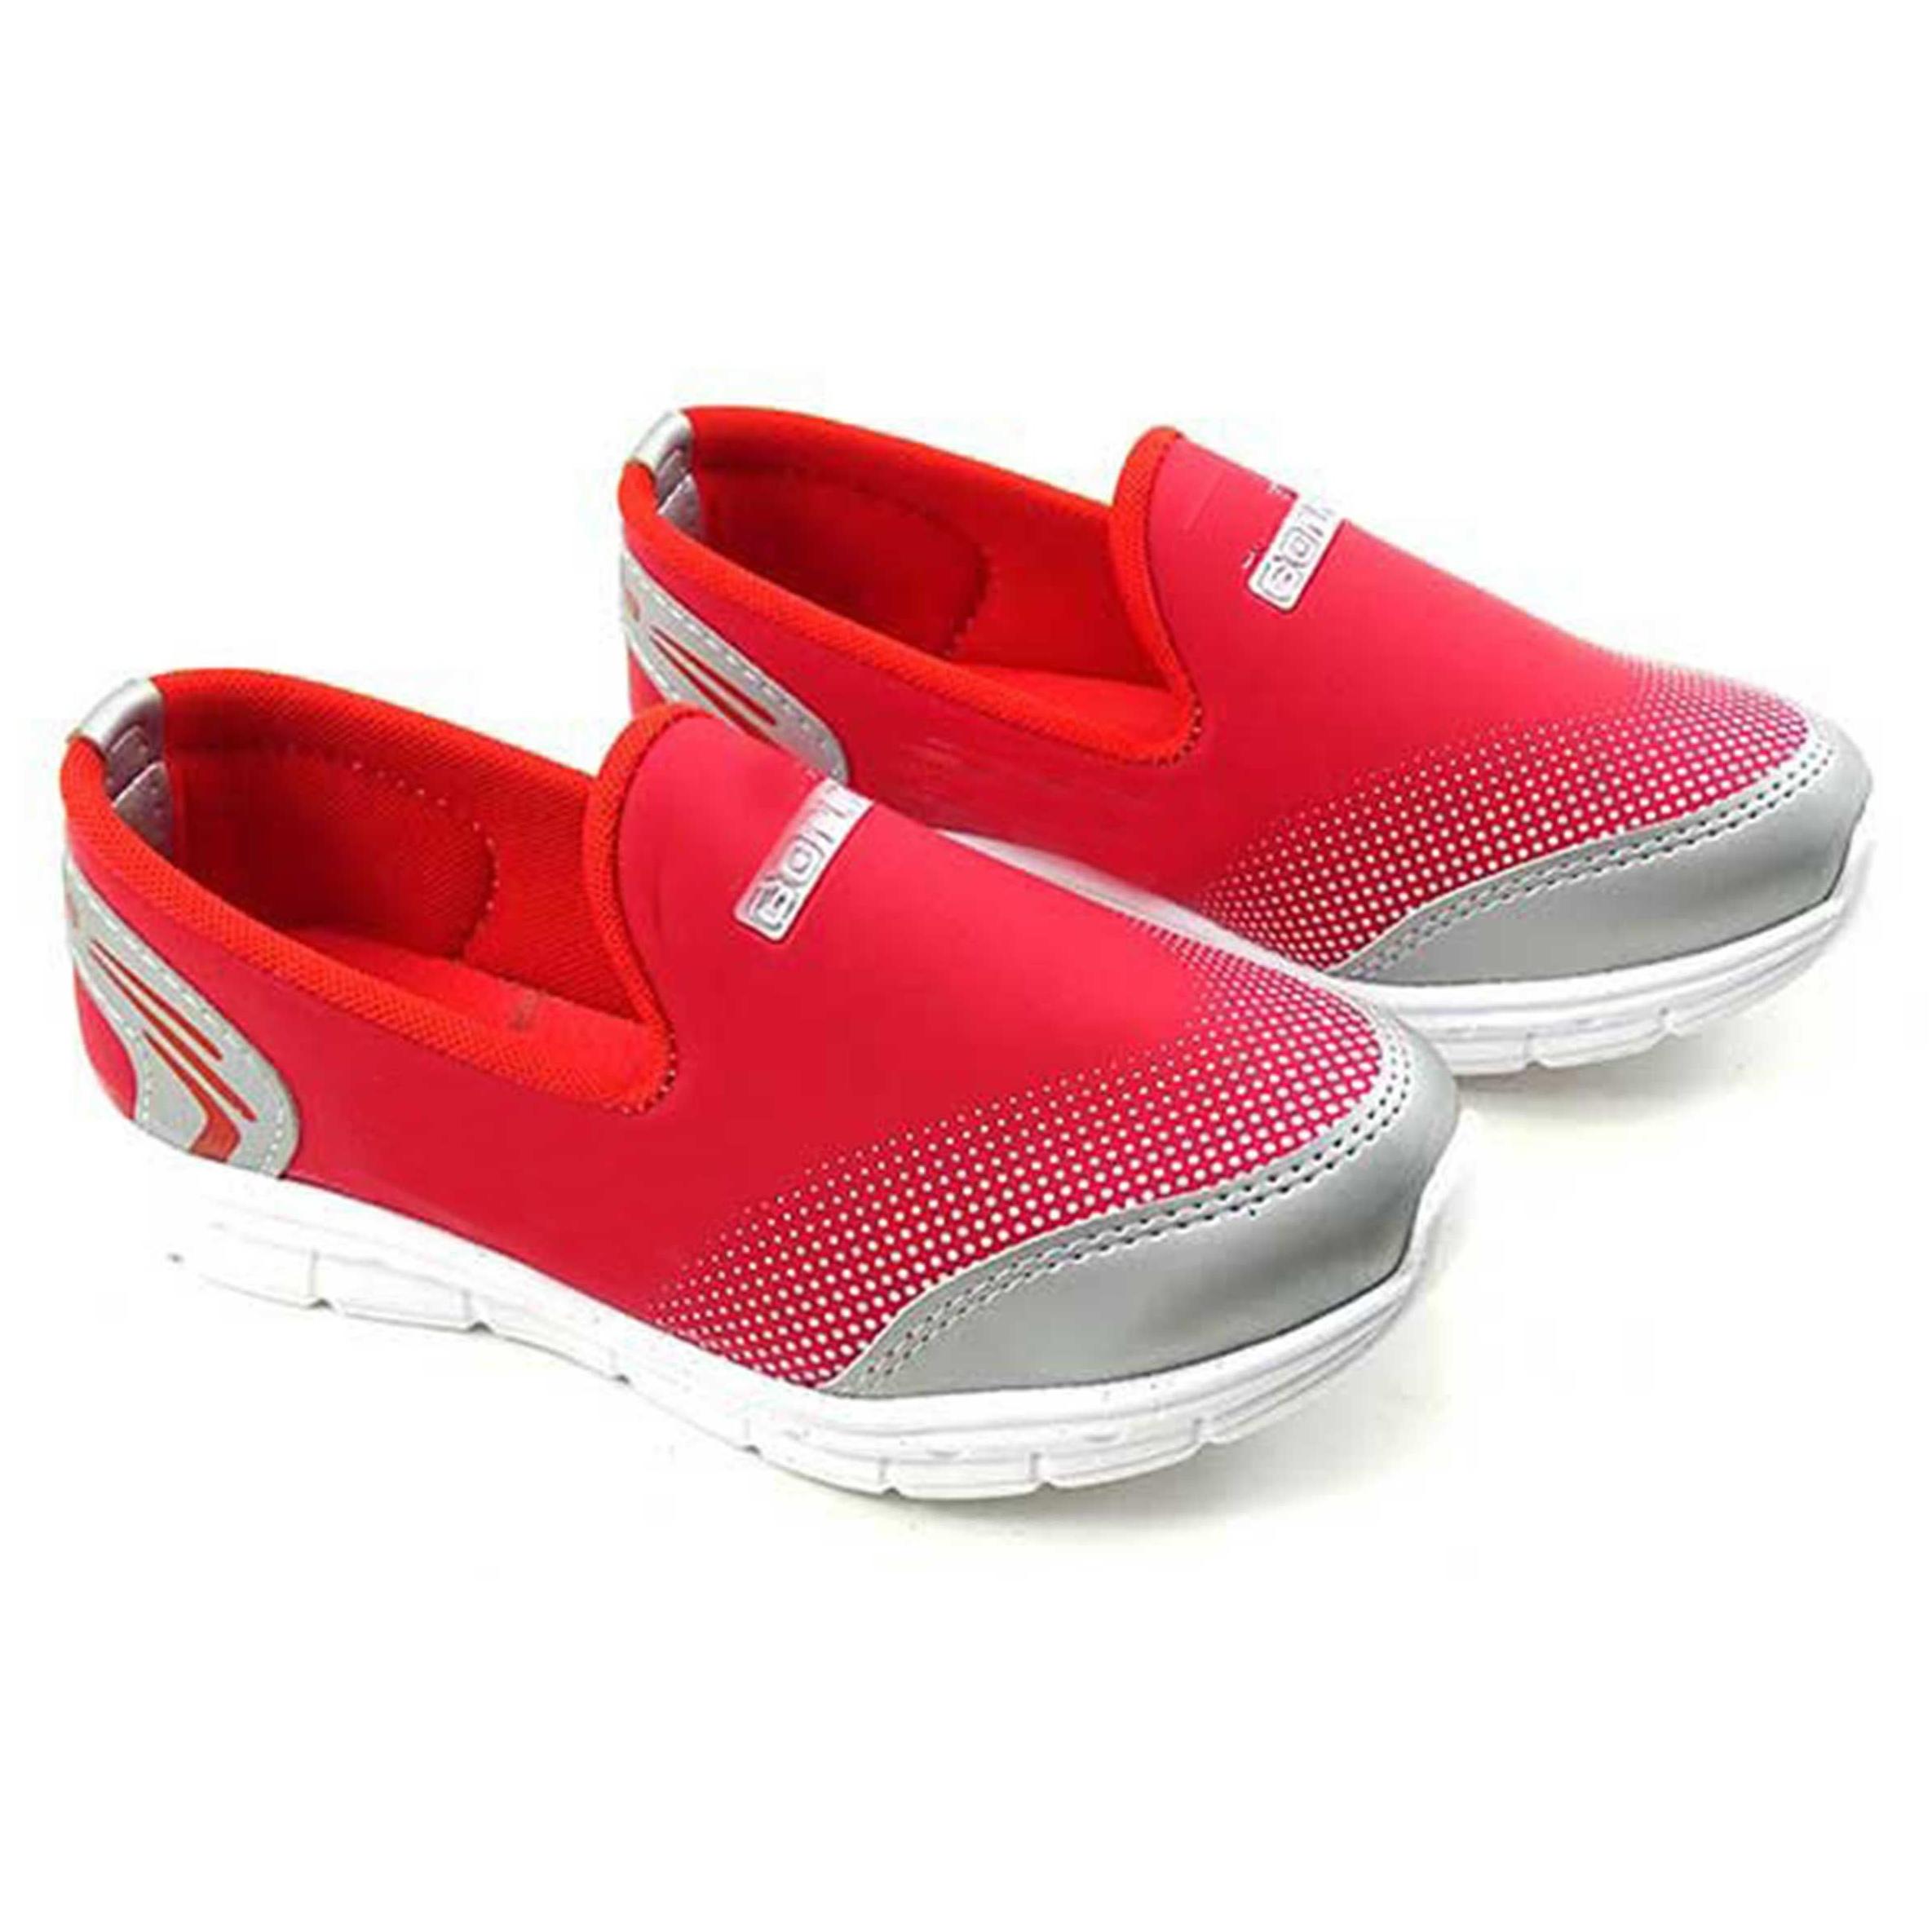 کفش راحتی پسرانه مدل B02710